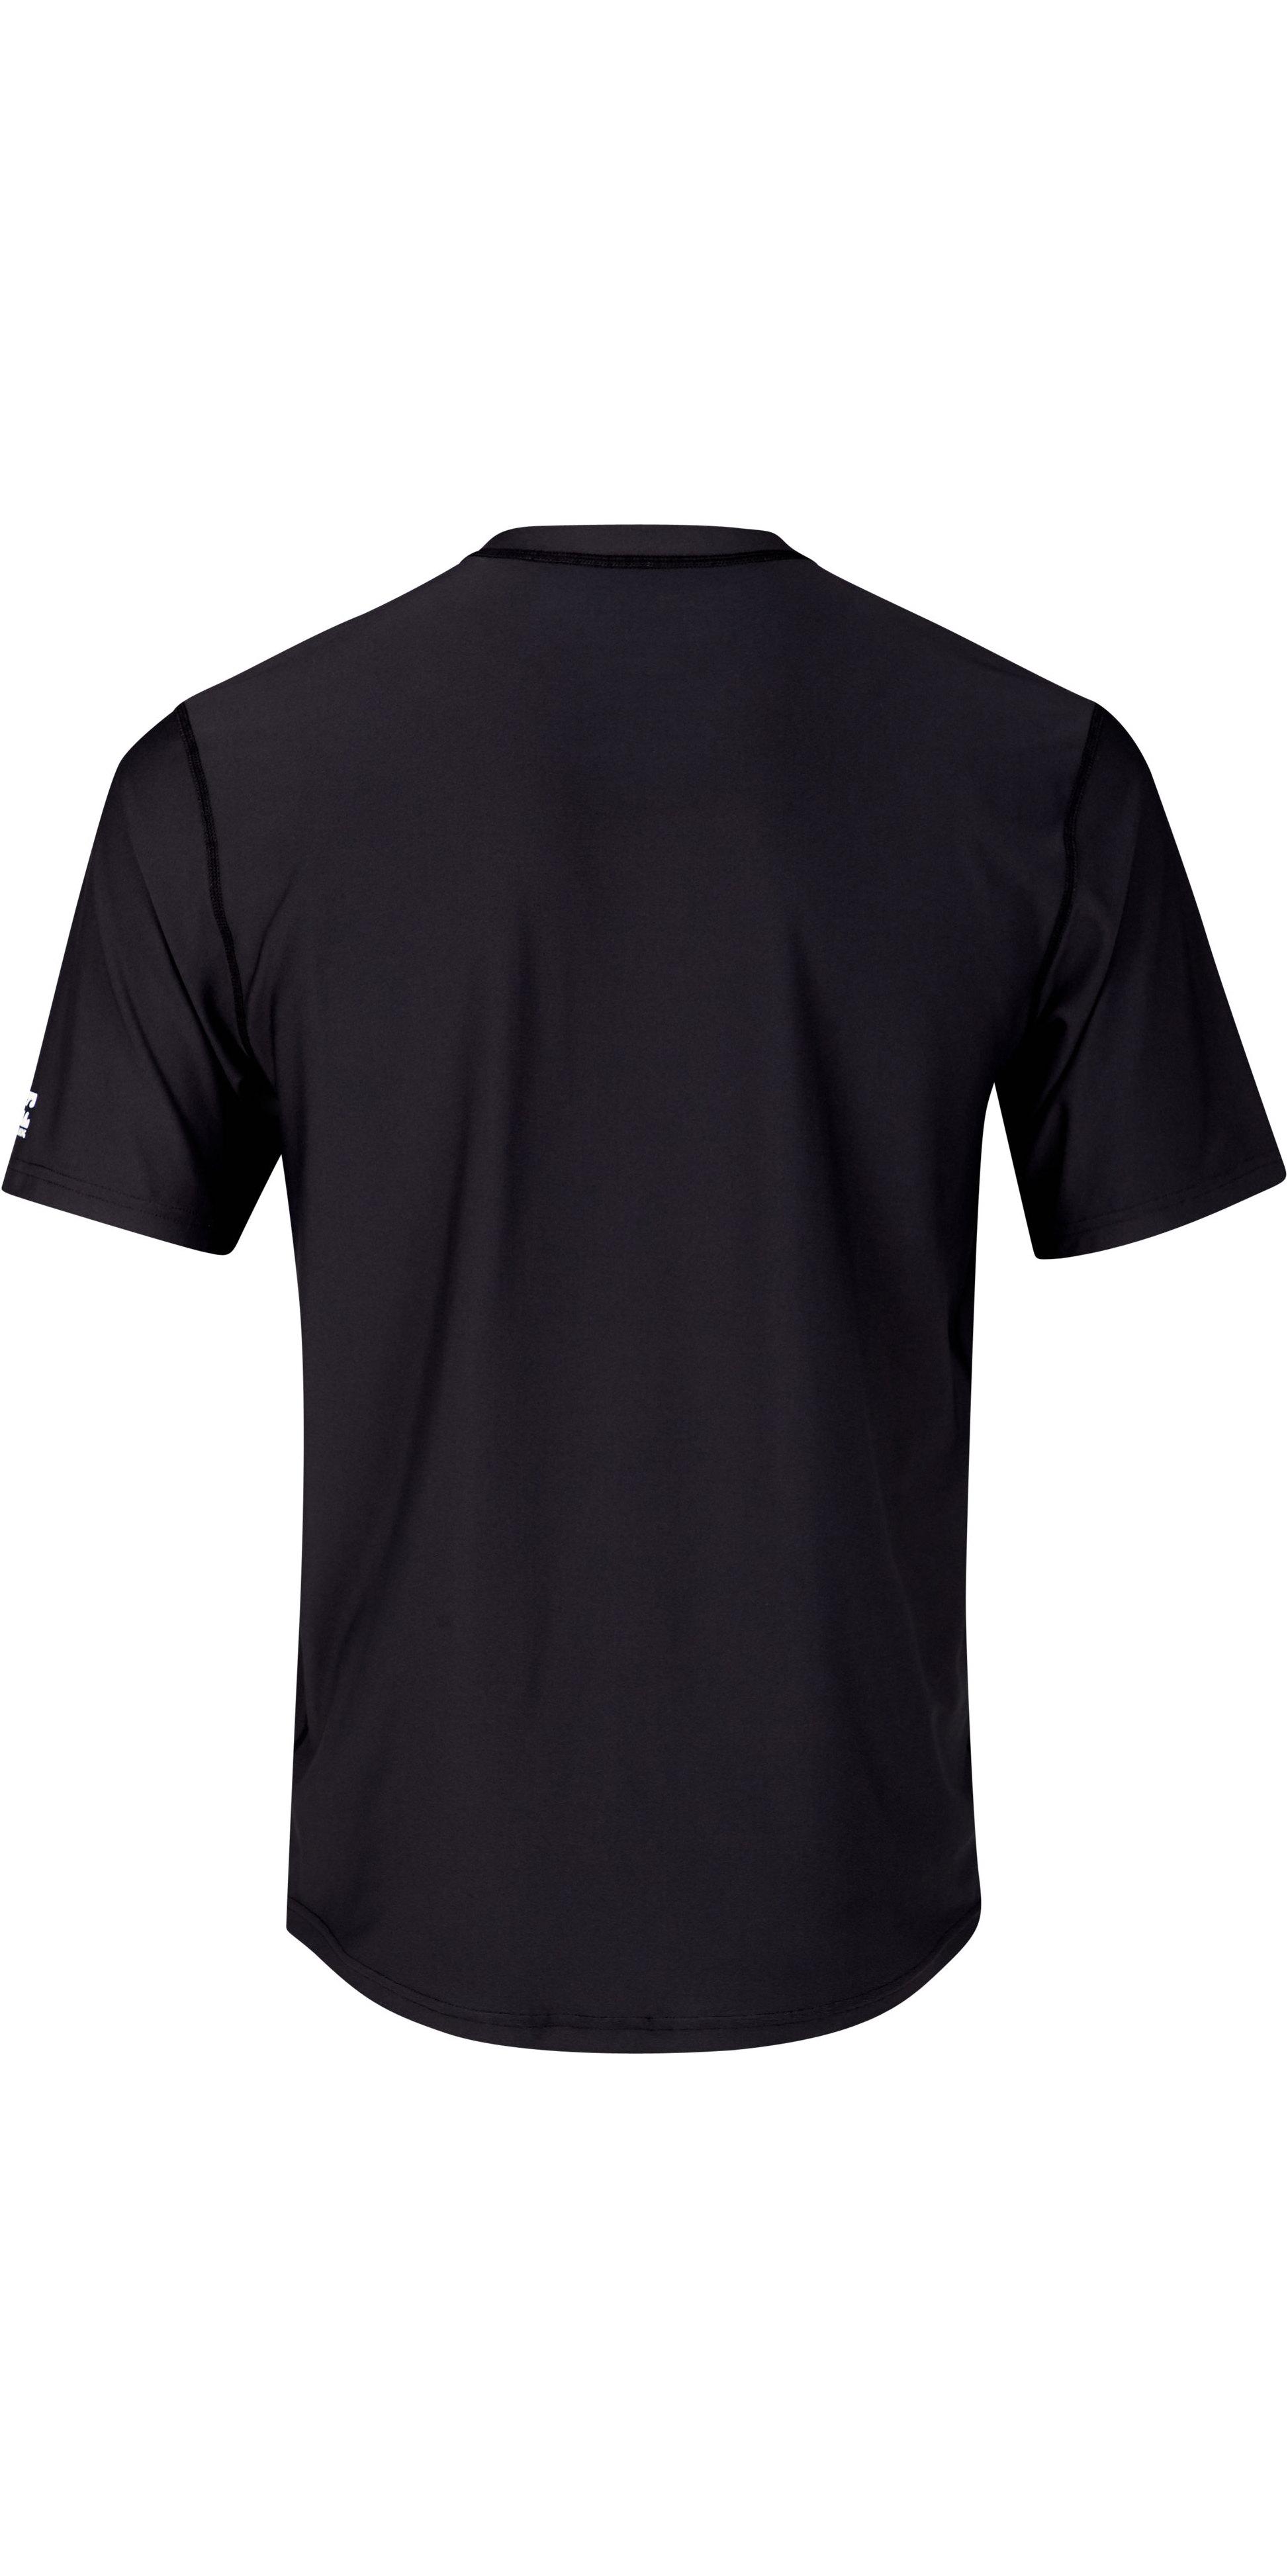 2019 Billabong Mens Rotated Short Sleeve Rash Vest Black N4MY10